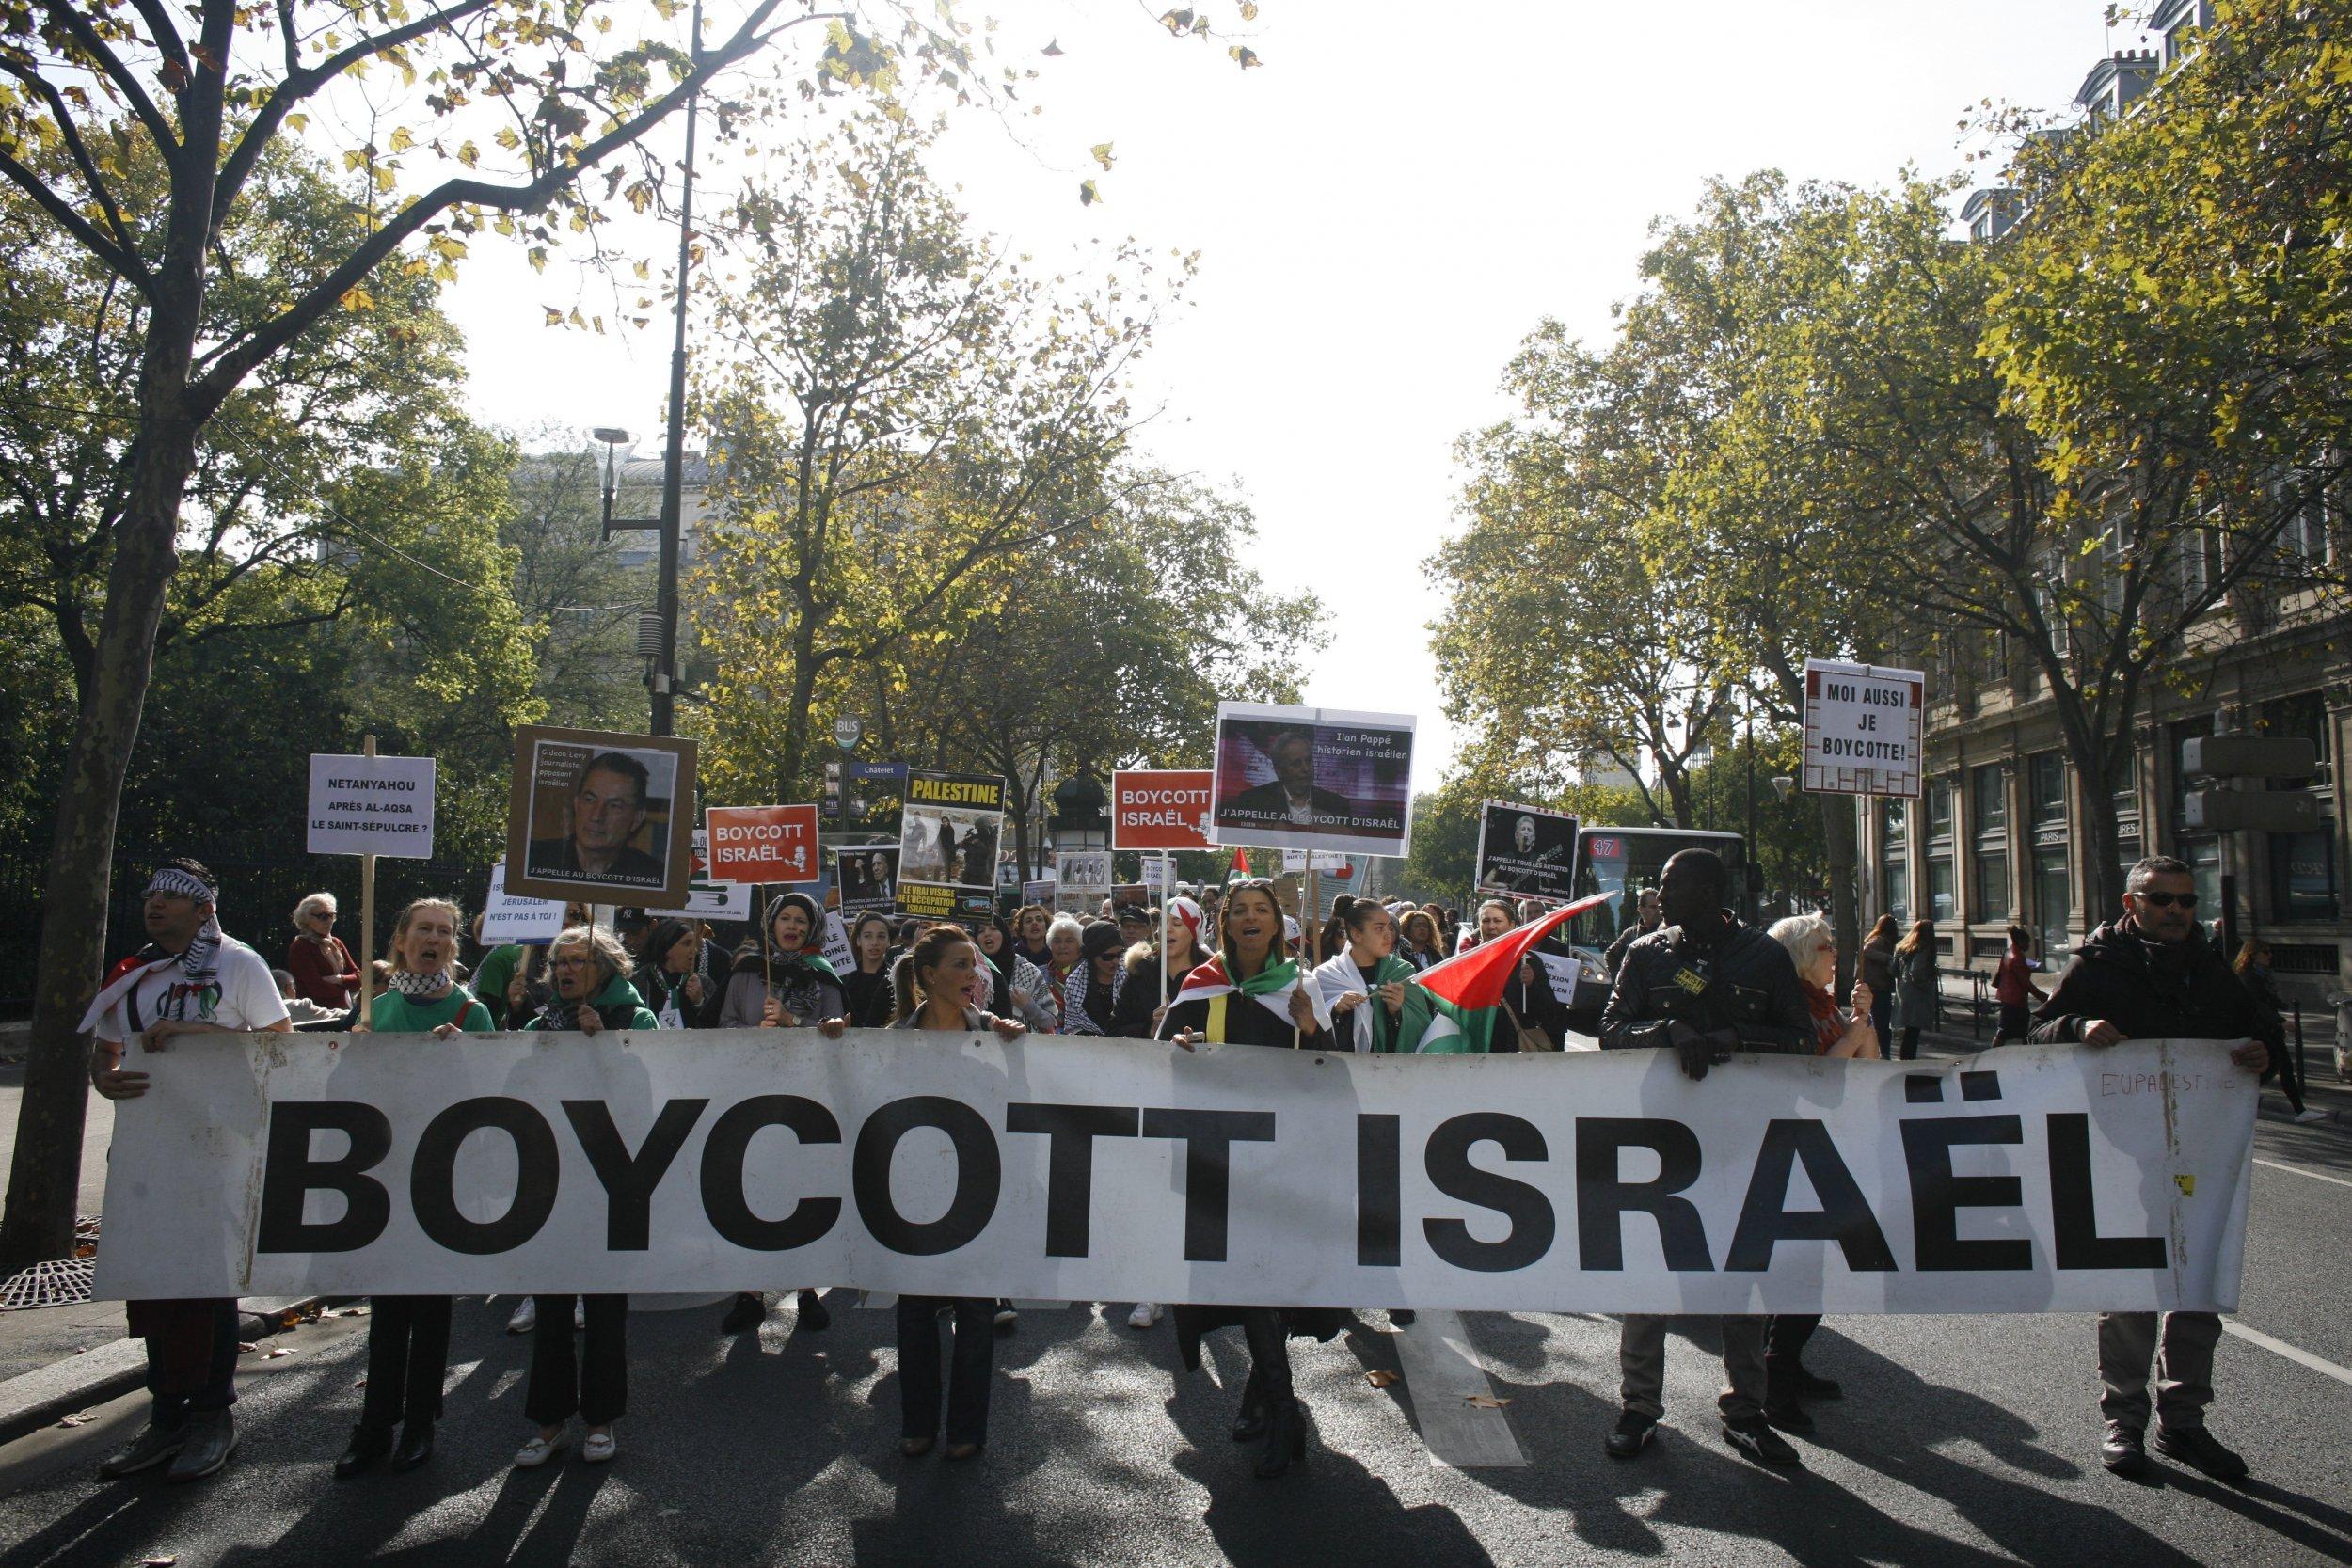 Boycott Israel protest in Paris